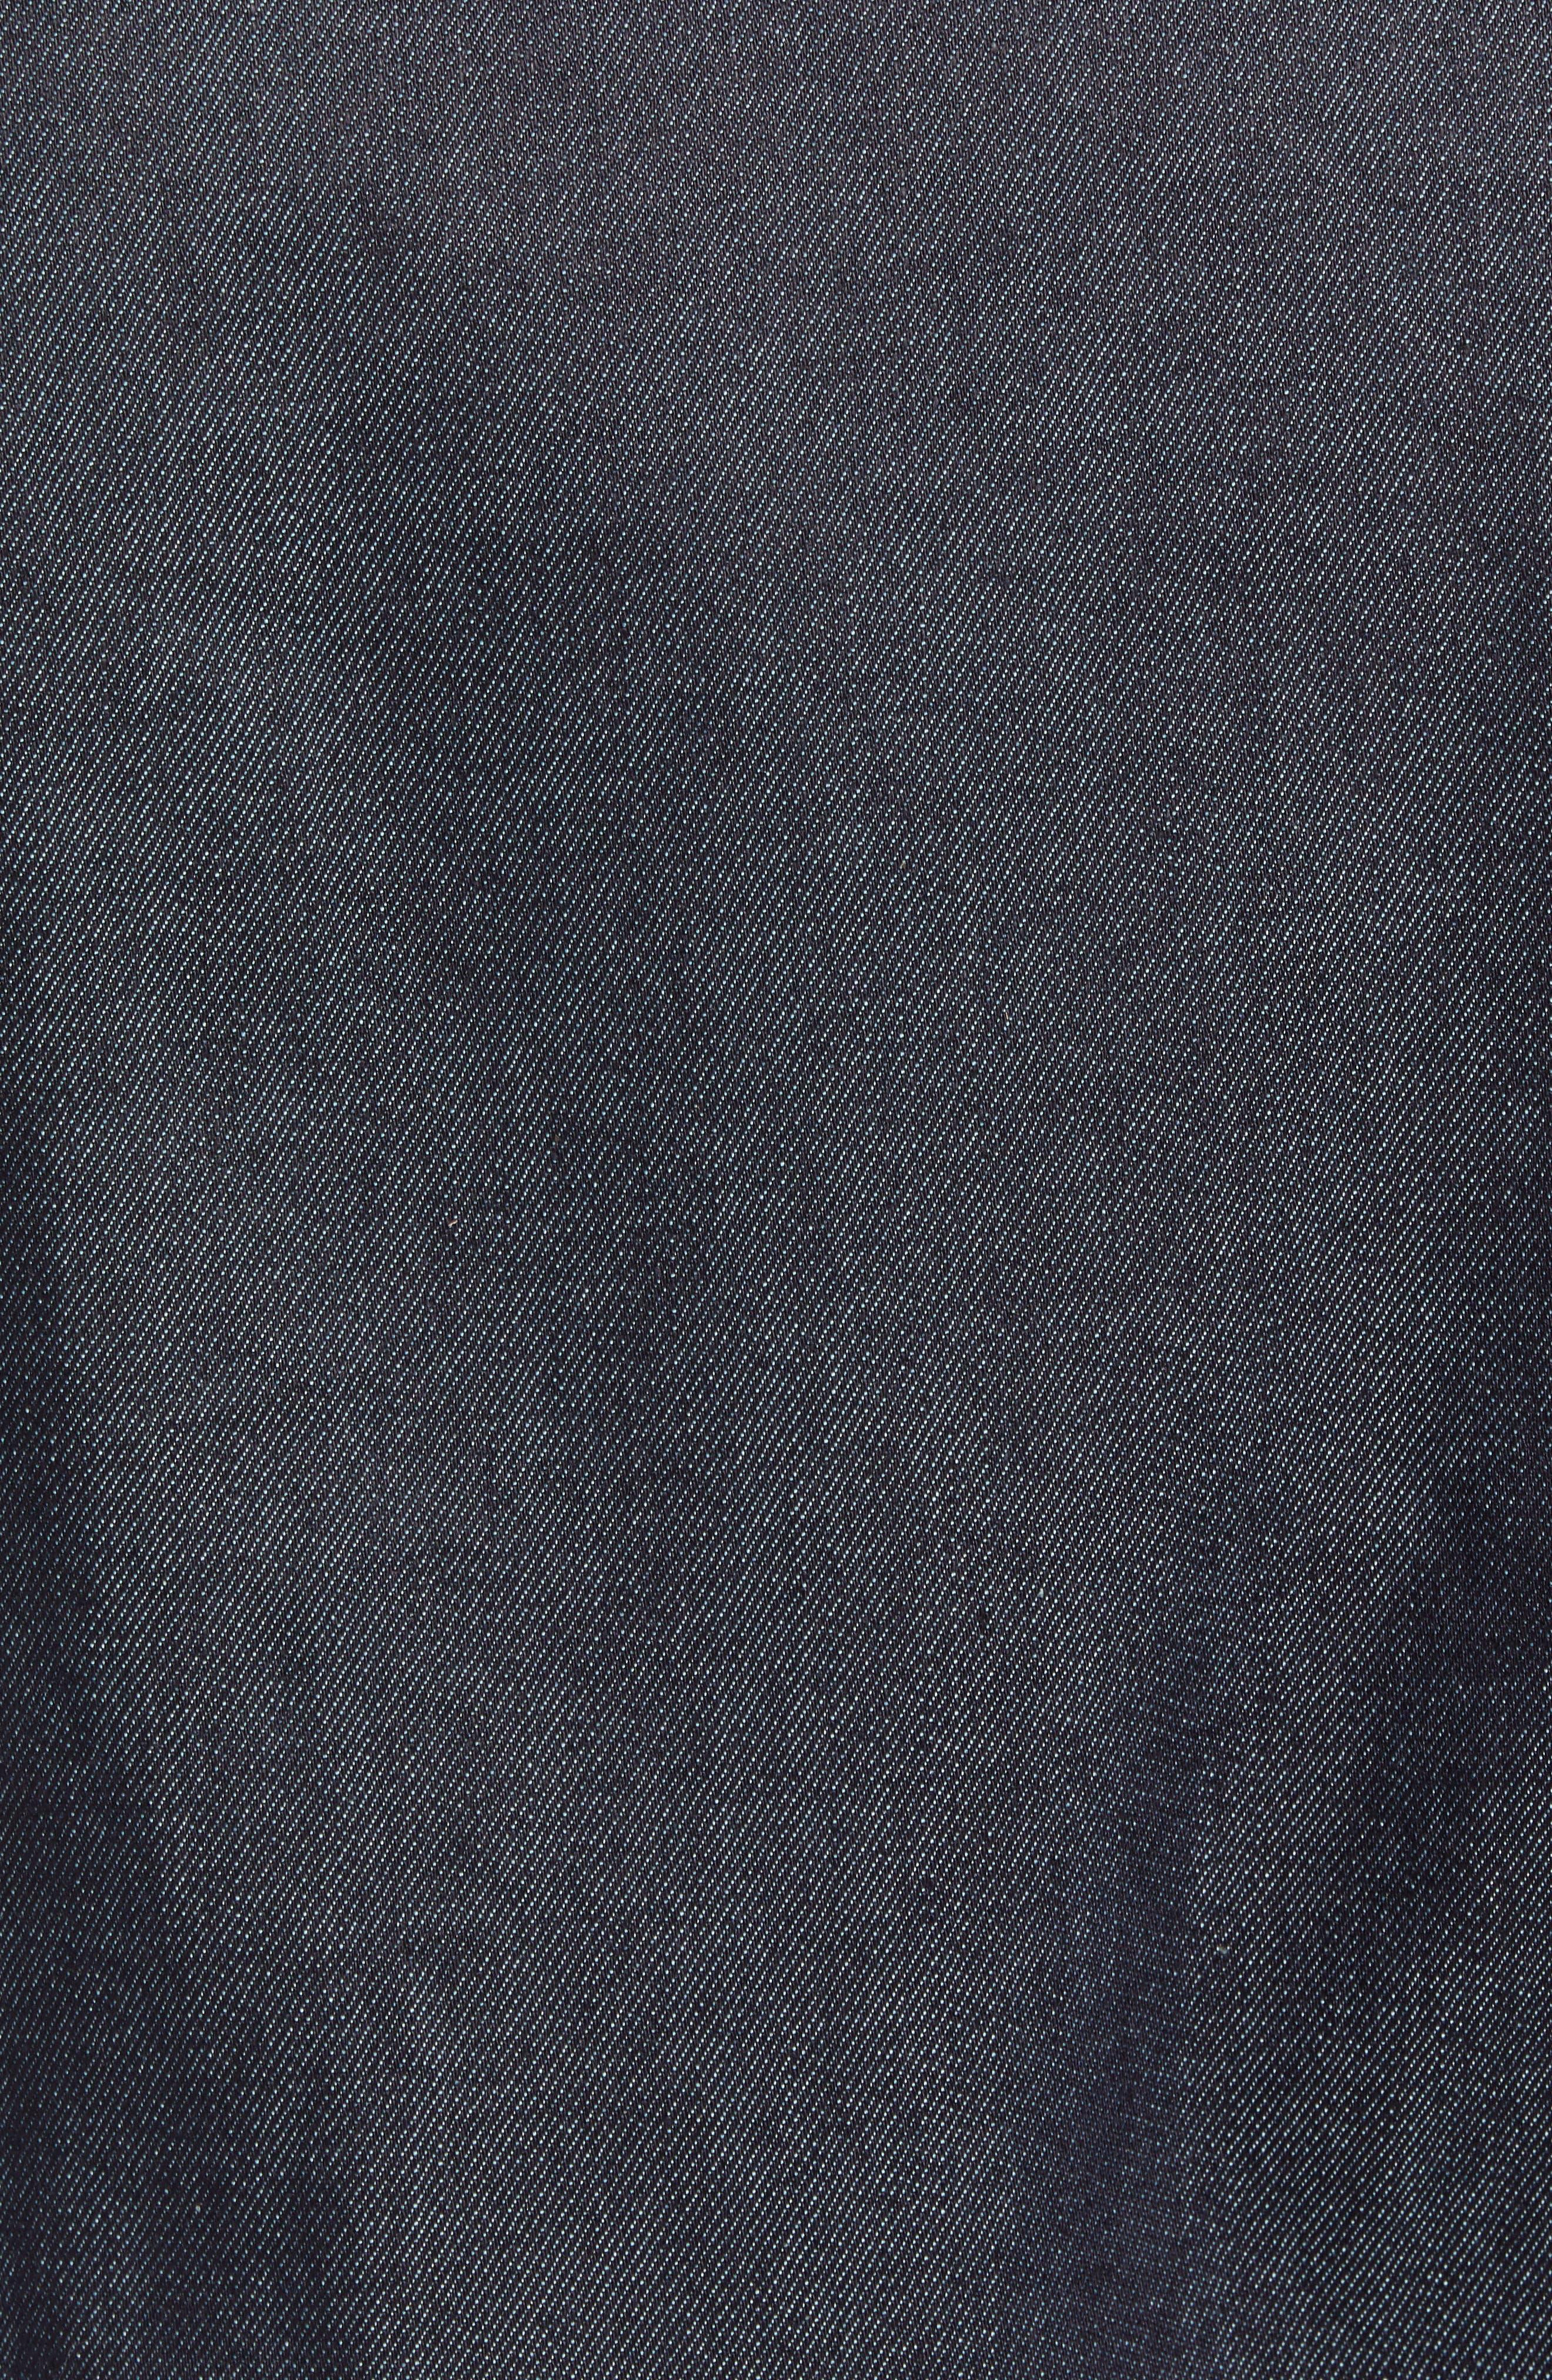 Heritage Denim Jacket,                             Alternate thumbnail 7, color,                             SELEVDGE RAW